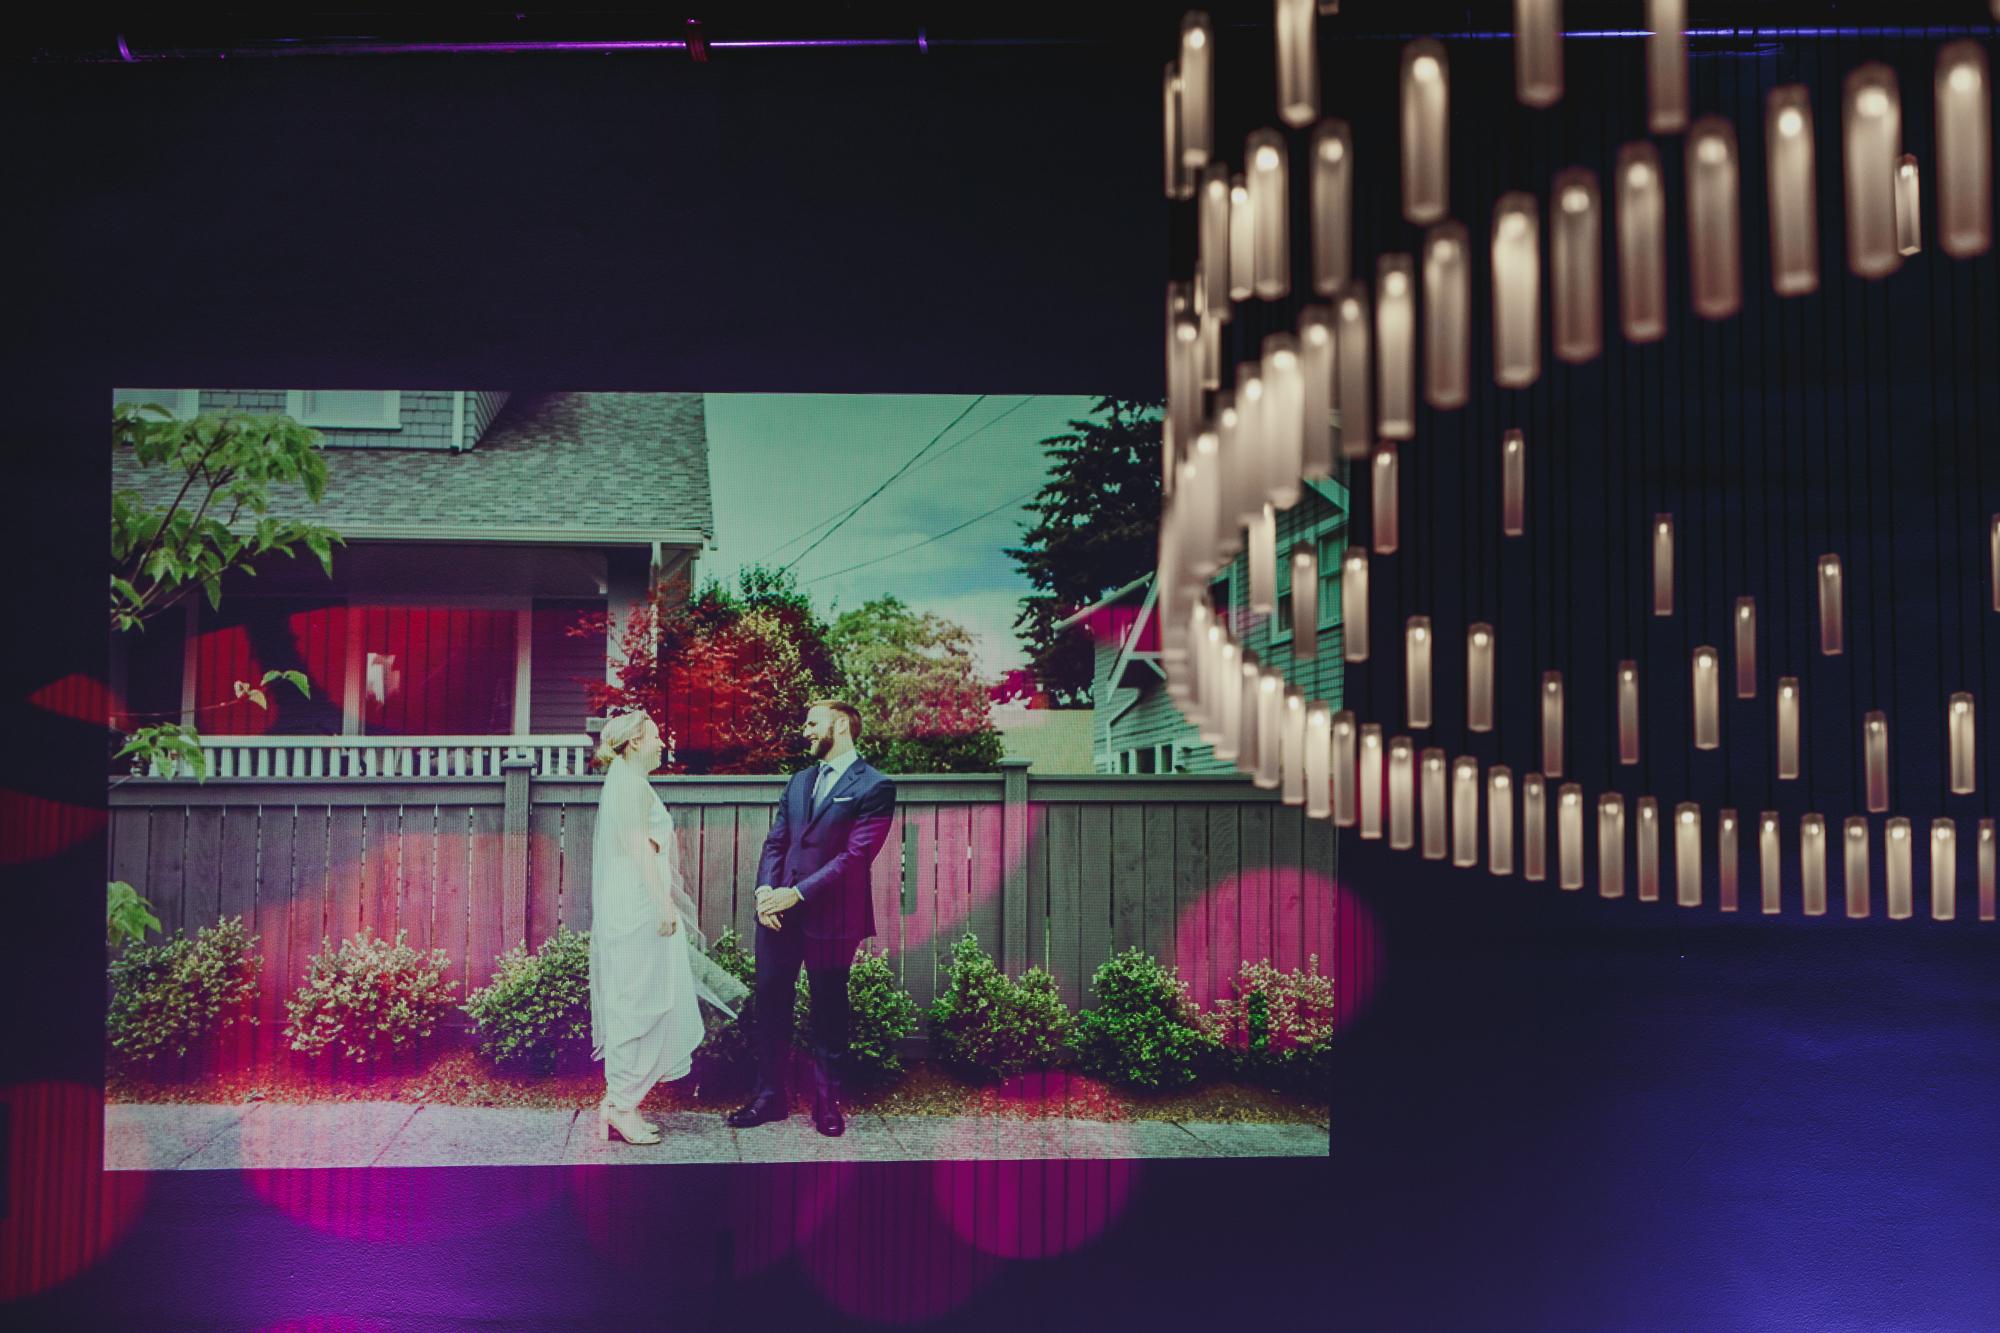 canvas event space wedding photos by Krista Welch-0135.jpg